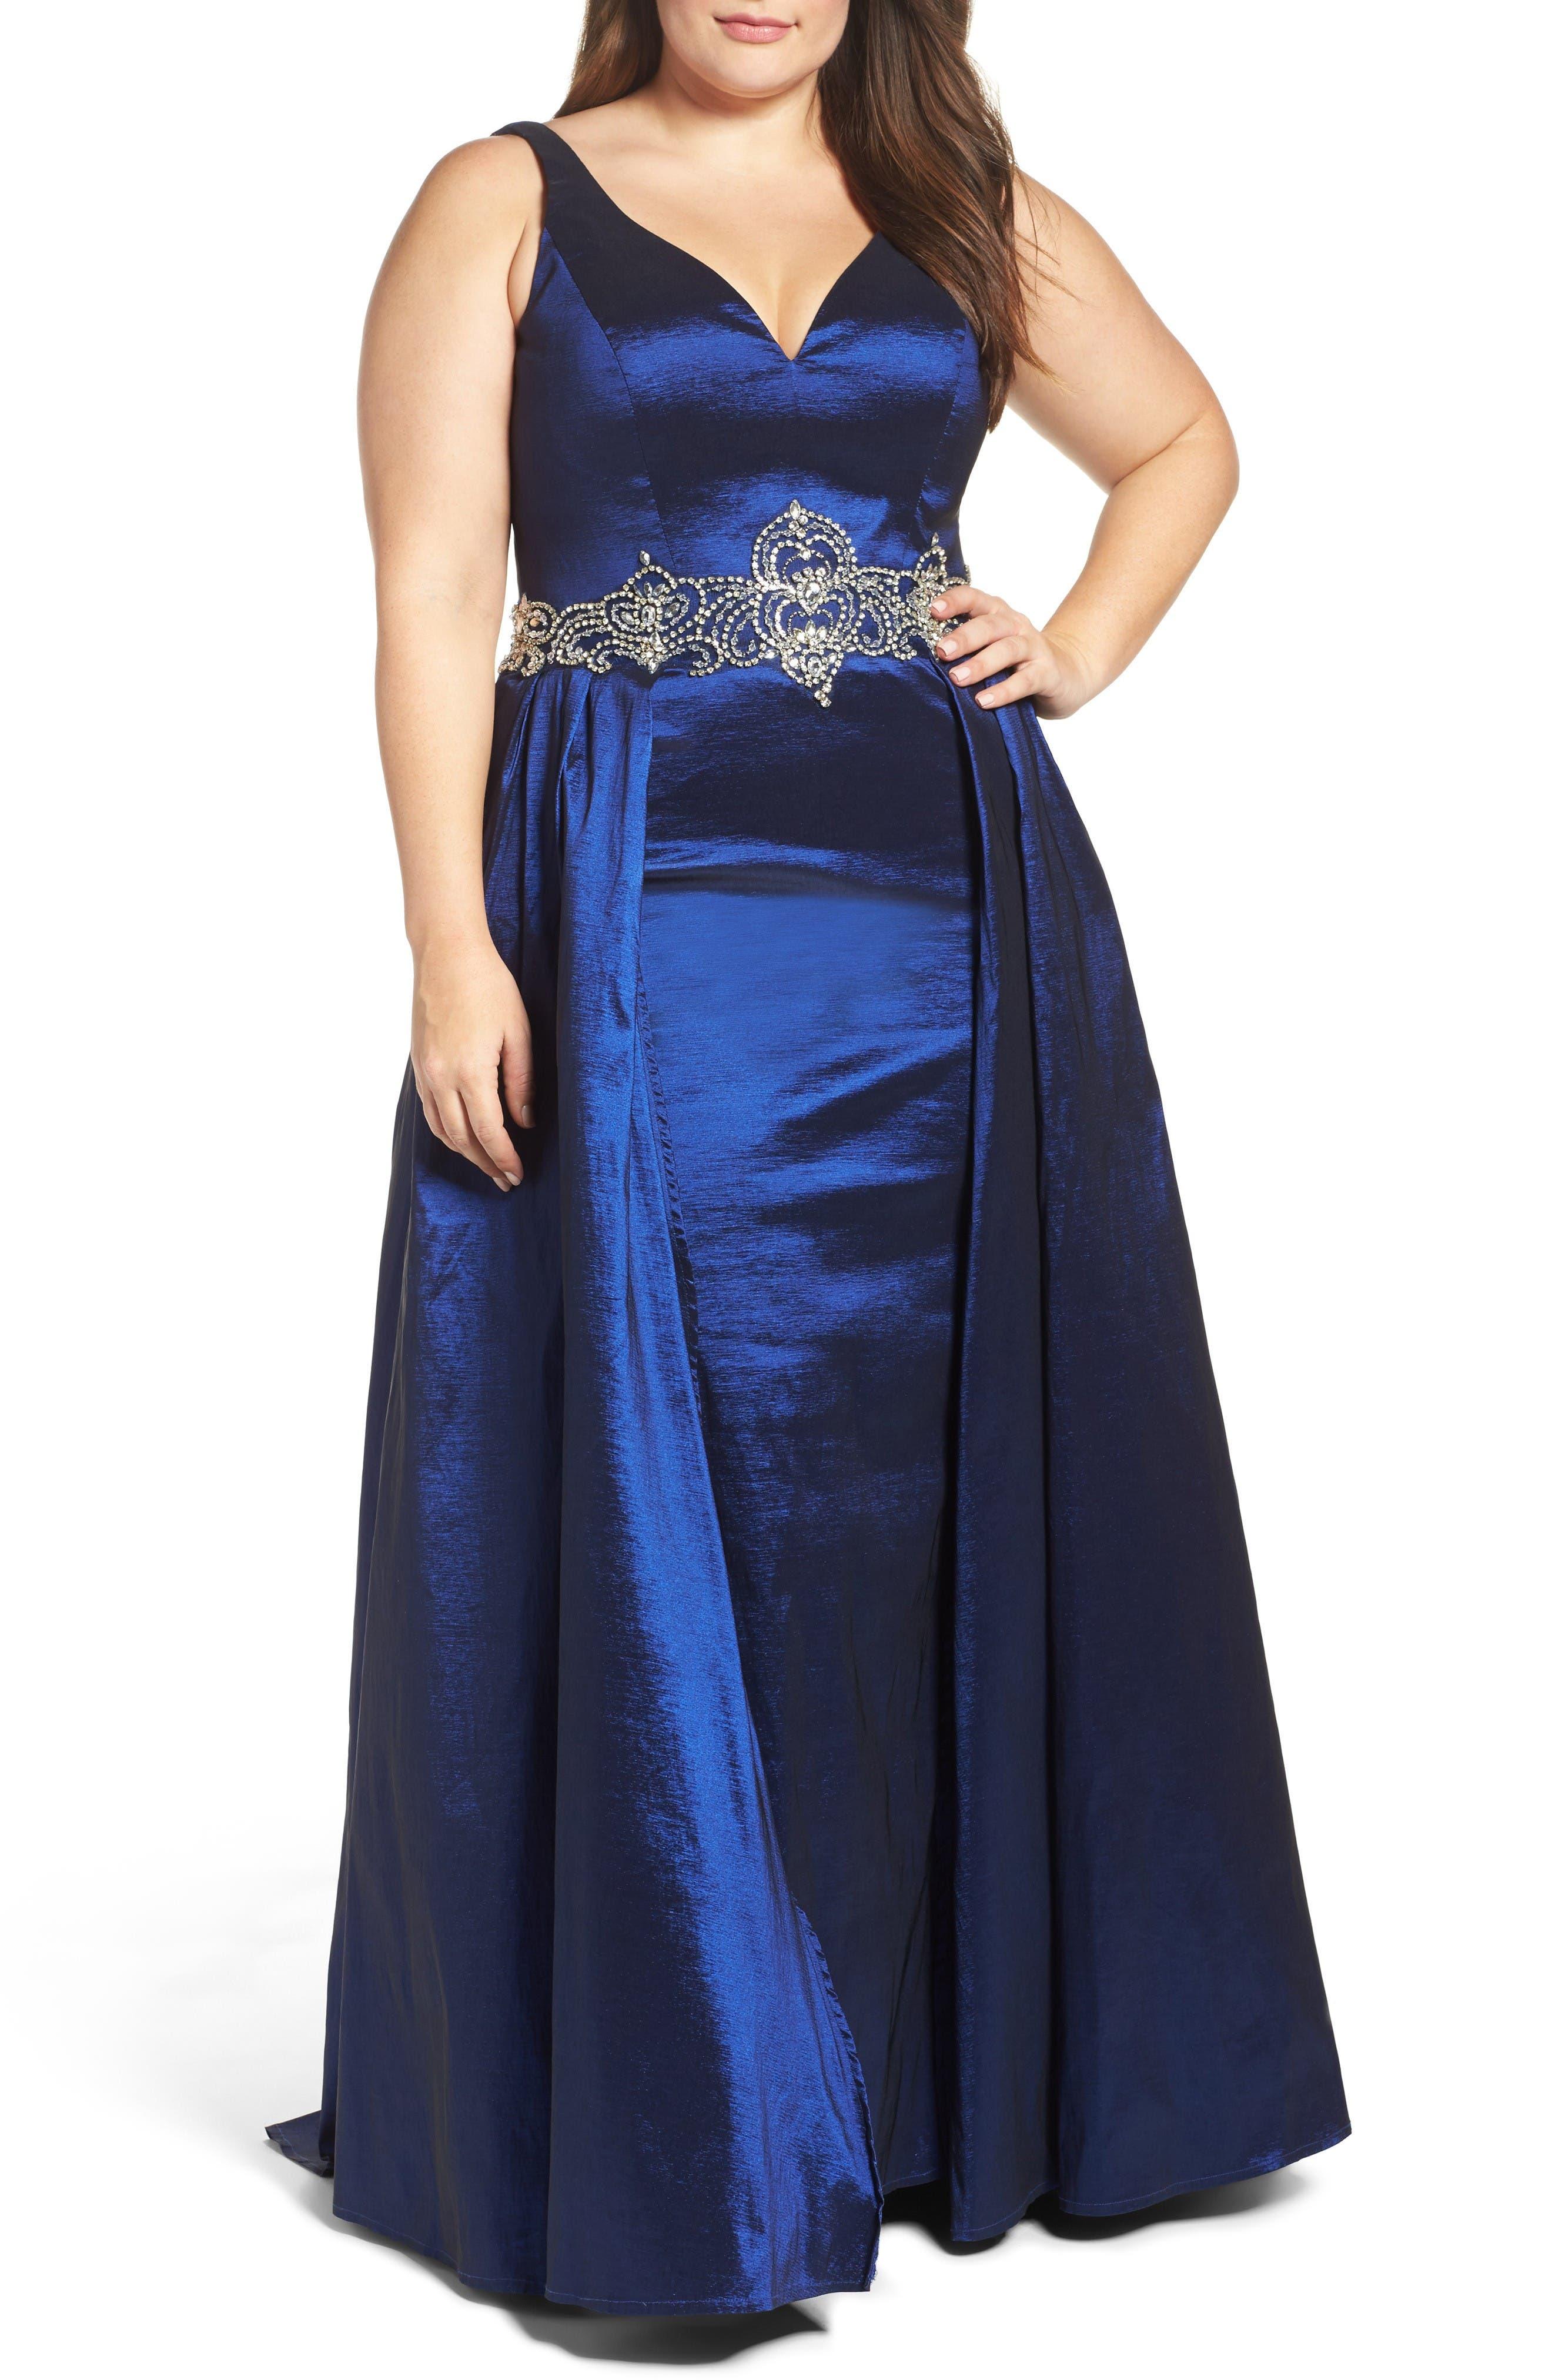 Main Image - Mac Duggal Embellished Waist Taffeta Ballgown (Plus Size)